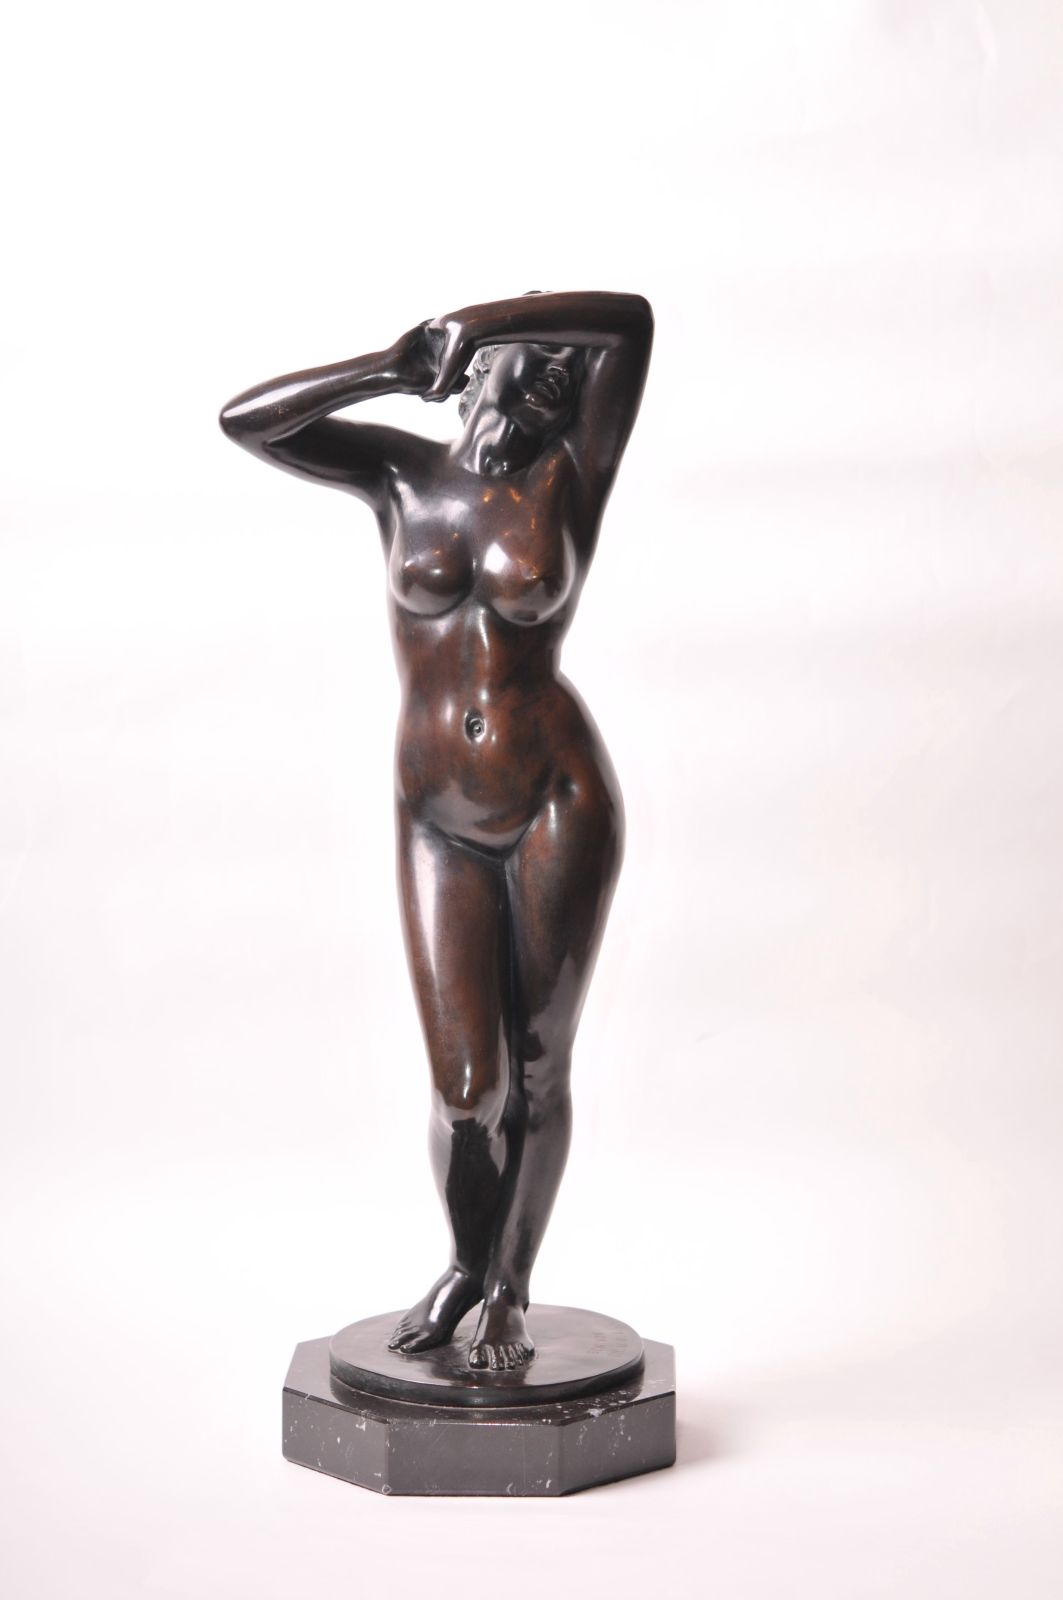 #108 Naked beauty, bronze |Nackte Schönheit, Bronze Image